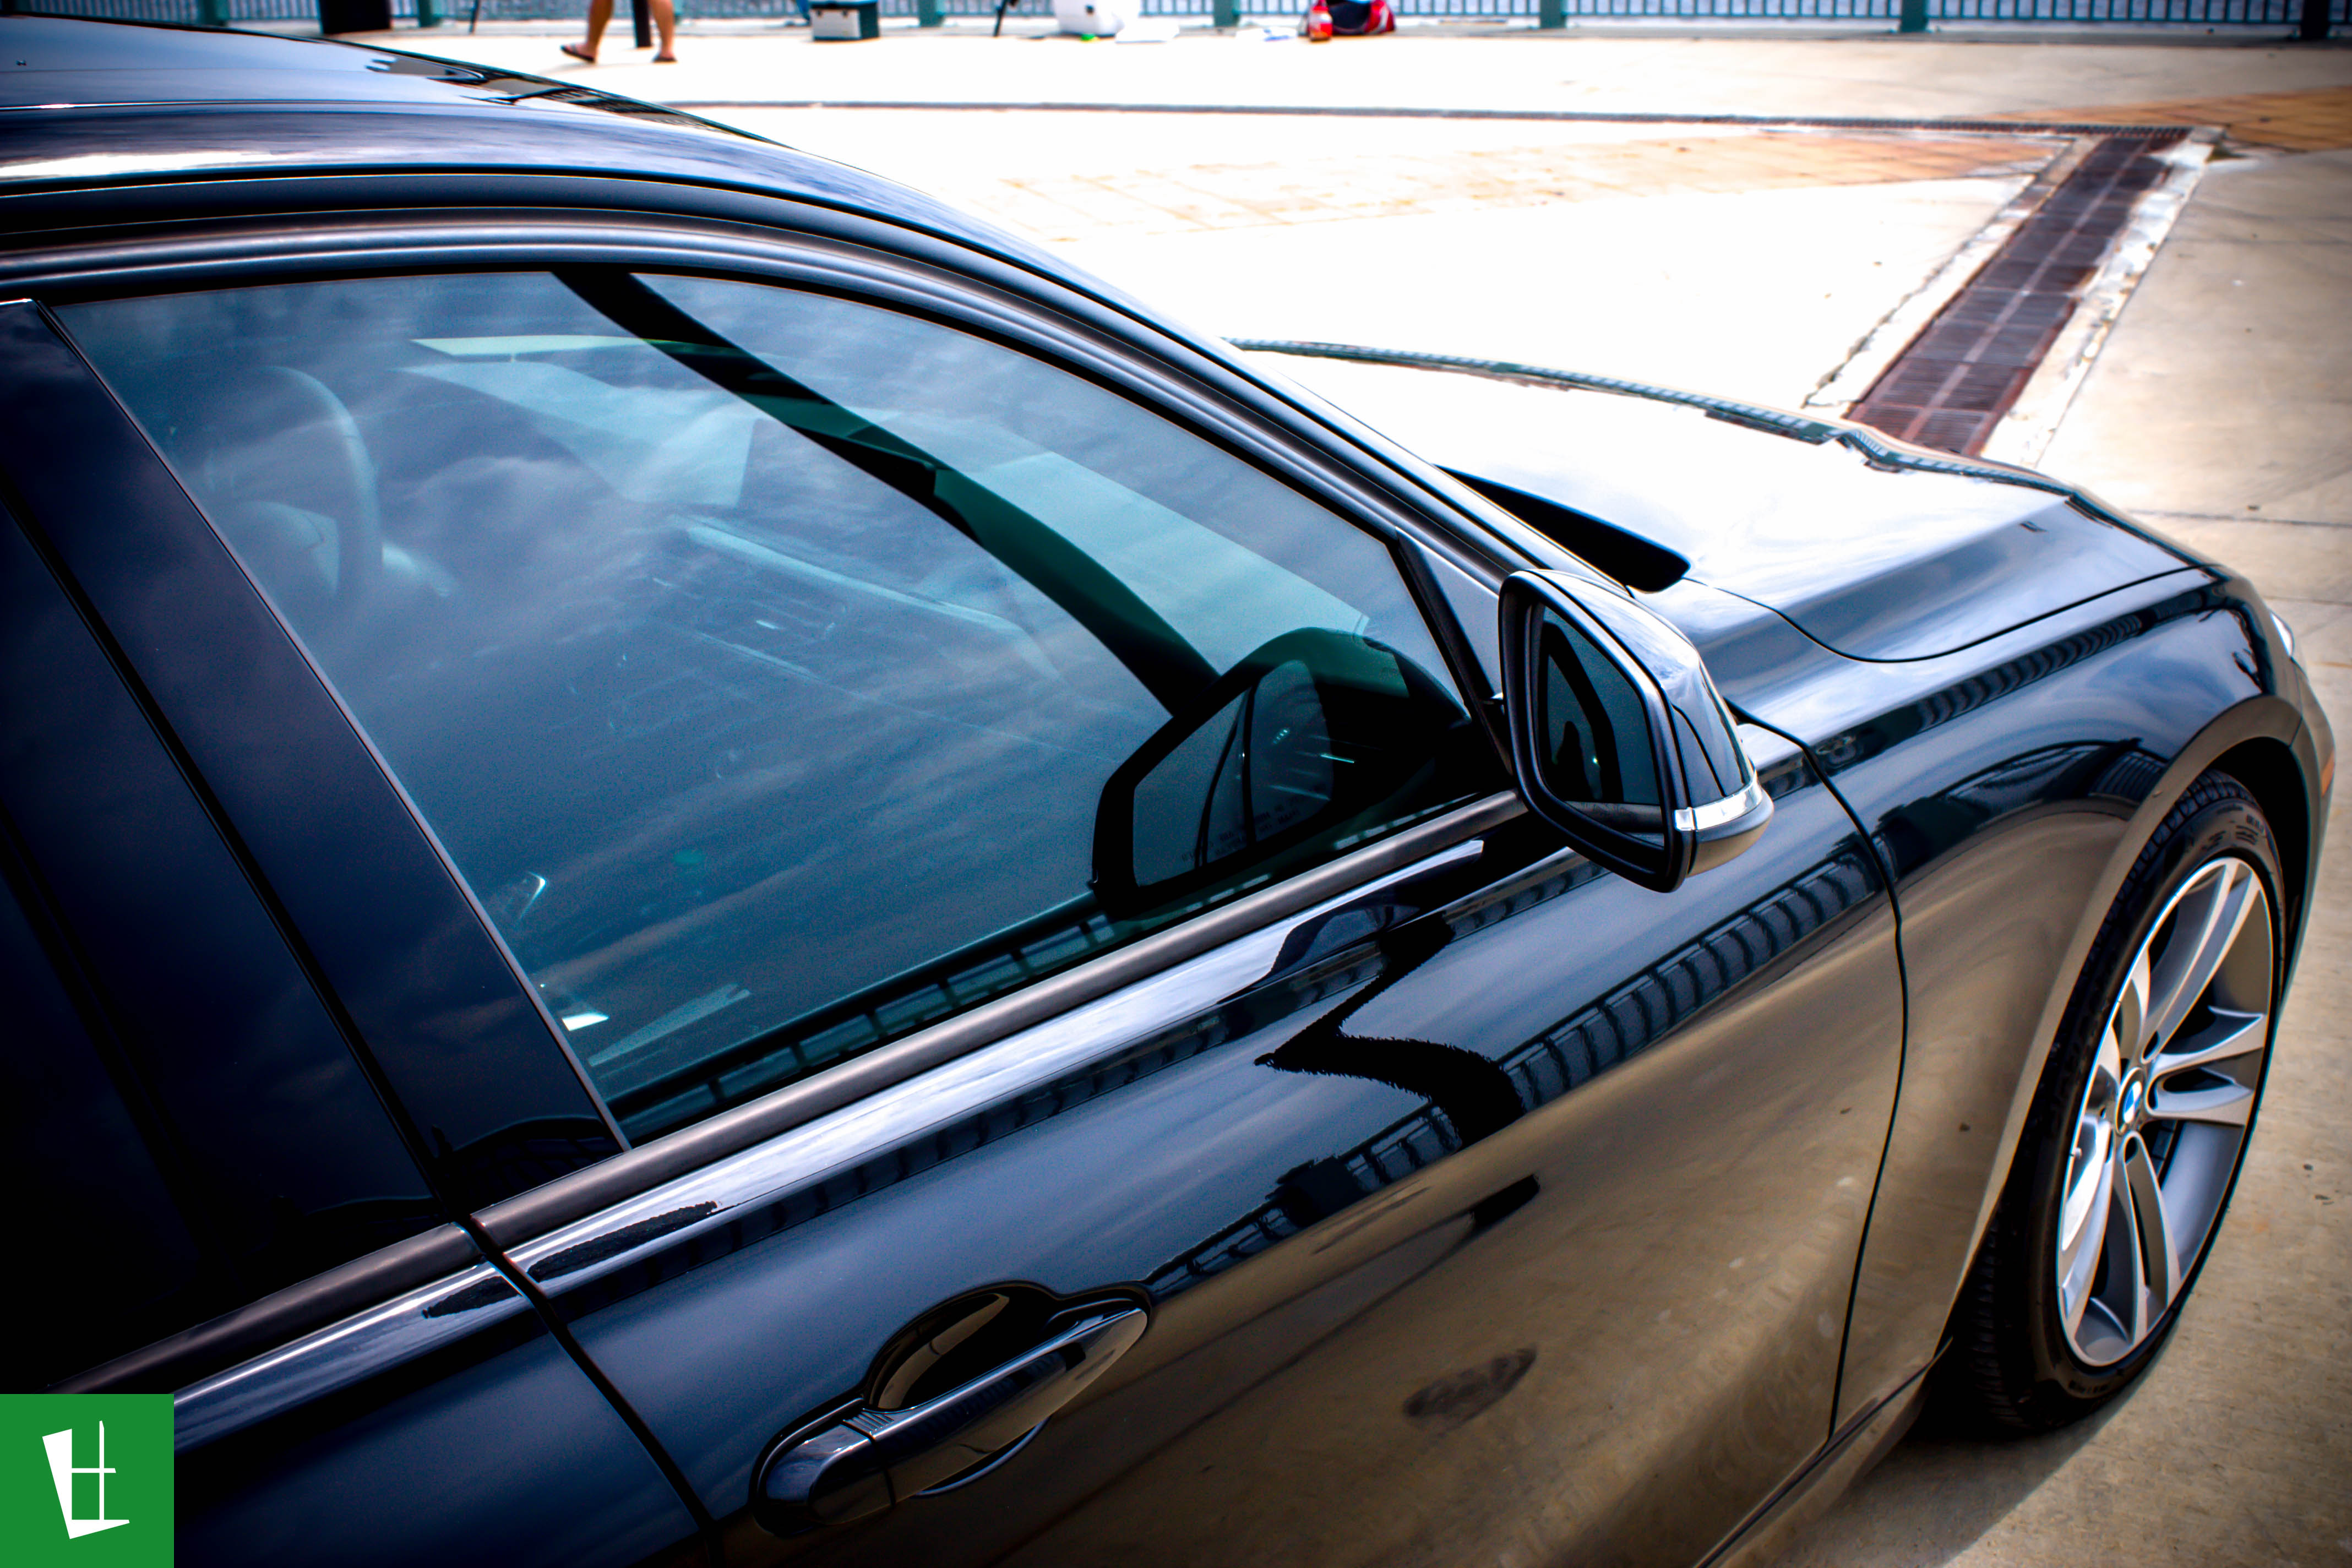 Glass wrap 2014 bmw 328d sedan window tinting 14 glass for 14 window tint